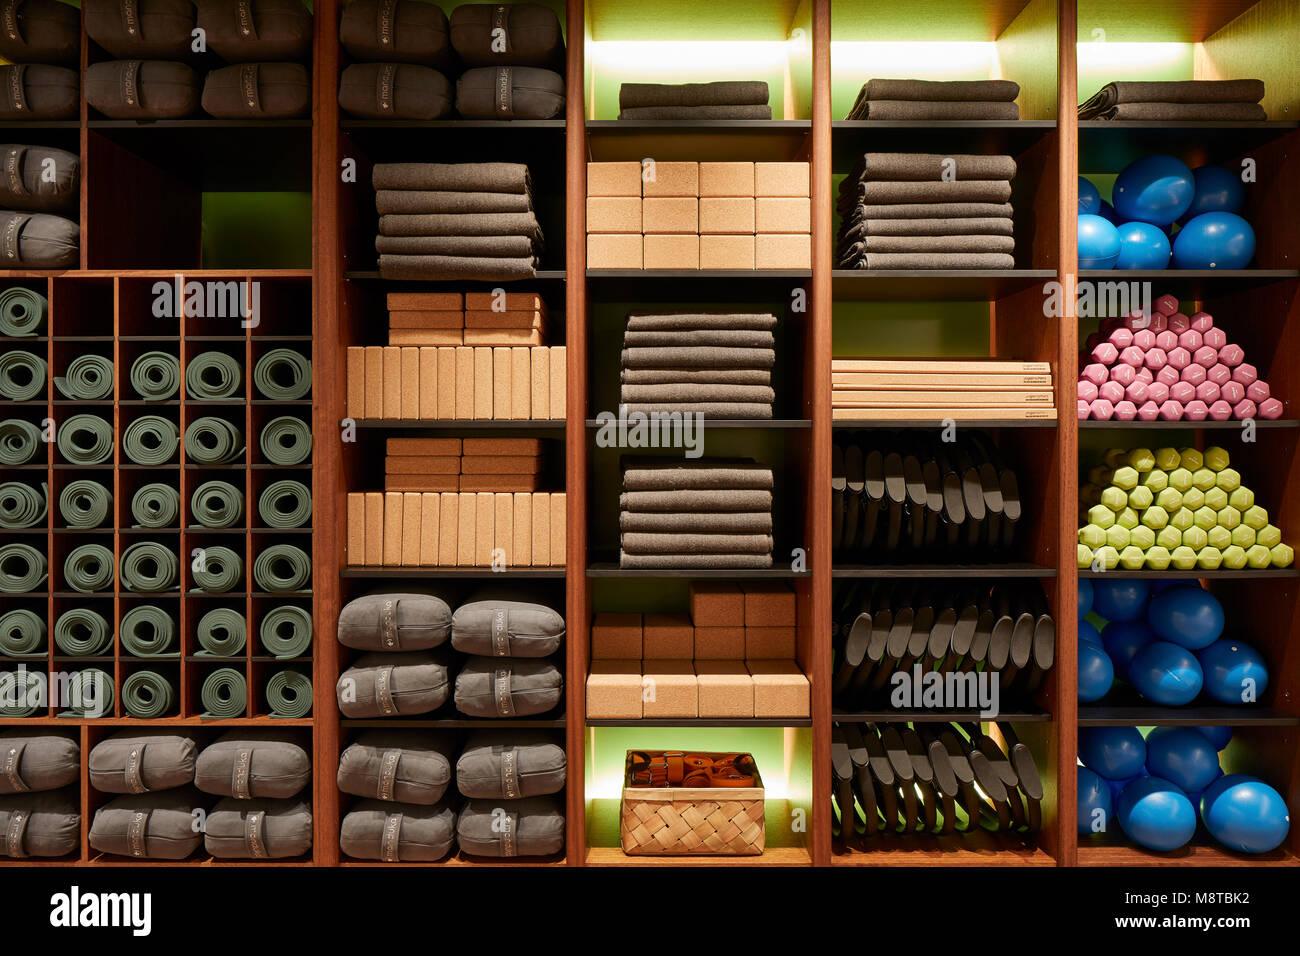 Storage shelf. KXU London, London, United Kingdom. Architect: Stiff + Trevillion Architects, 2017. - Stock Image